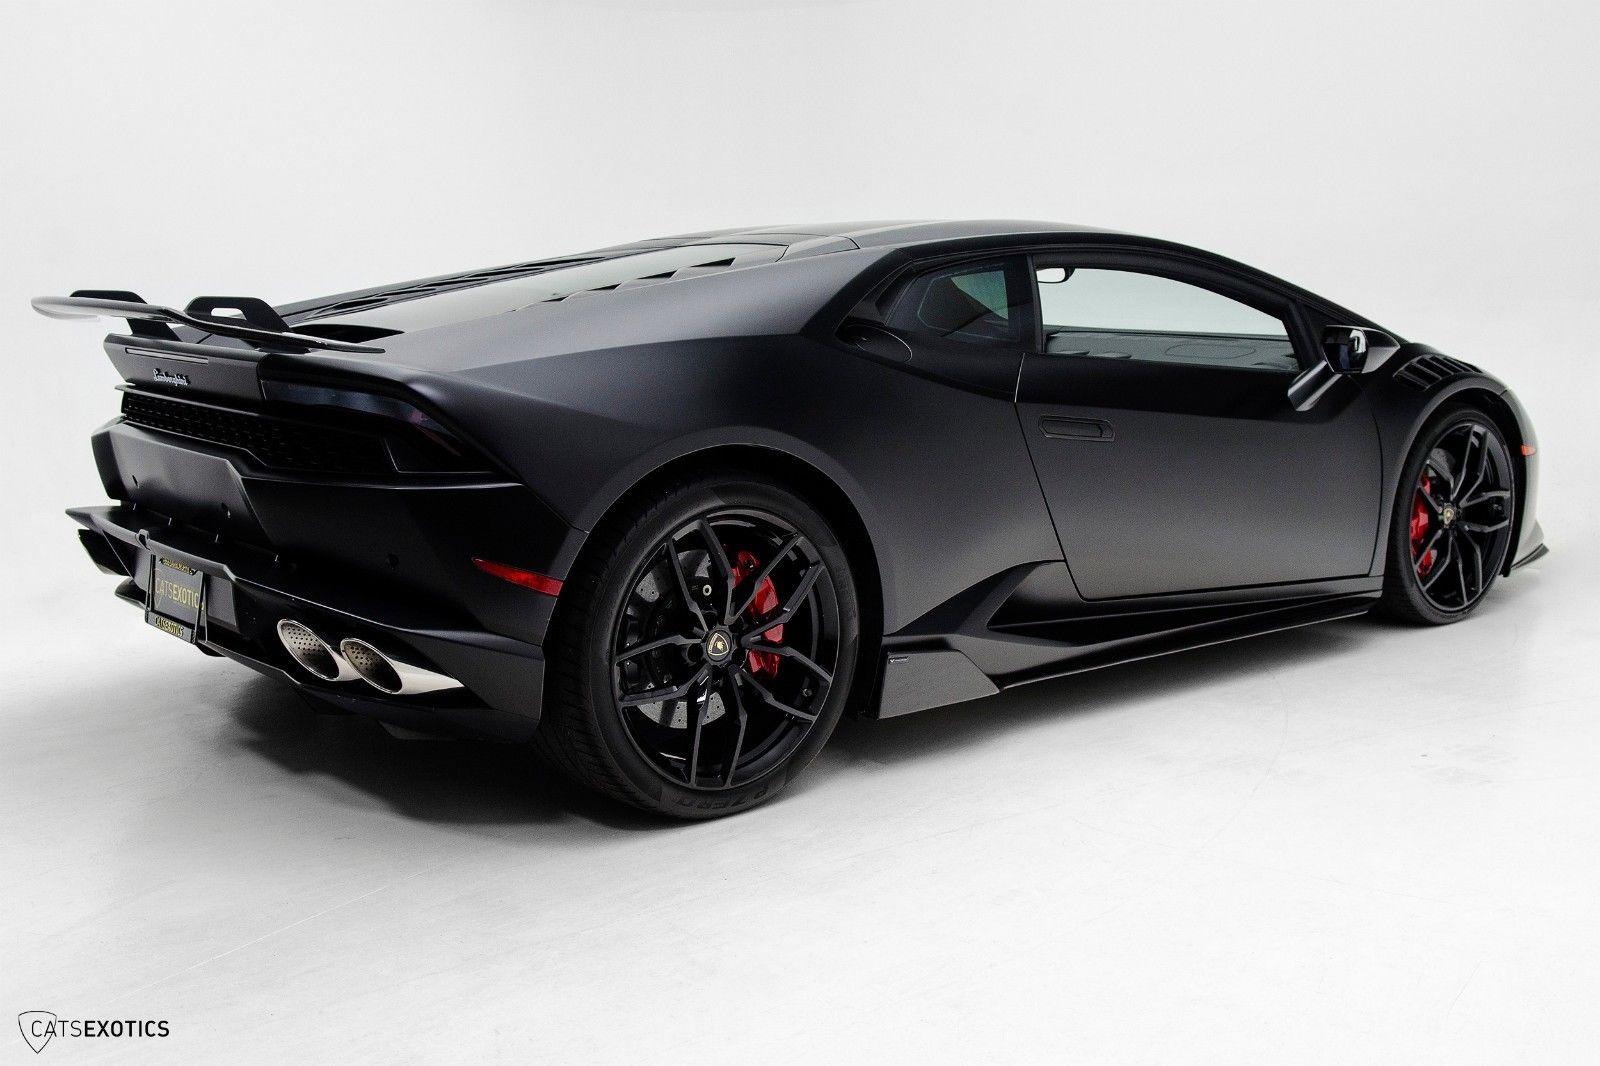 Amazing 2016 Lamborghini Huracan Lp 610 4 Vorsteiner Vorsteiner